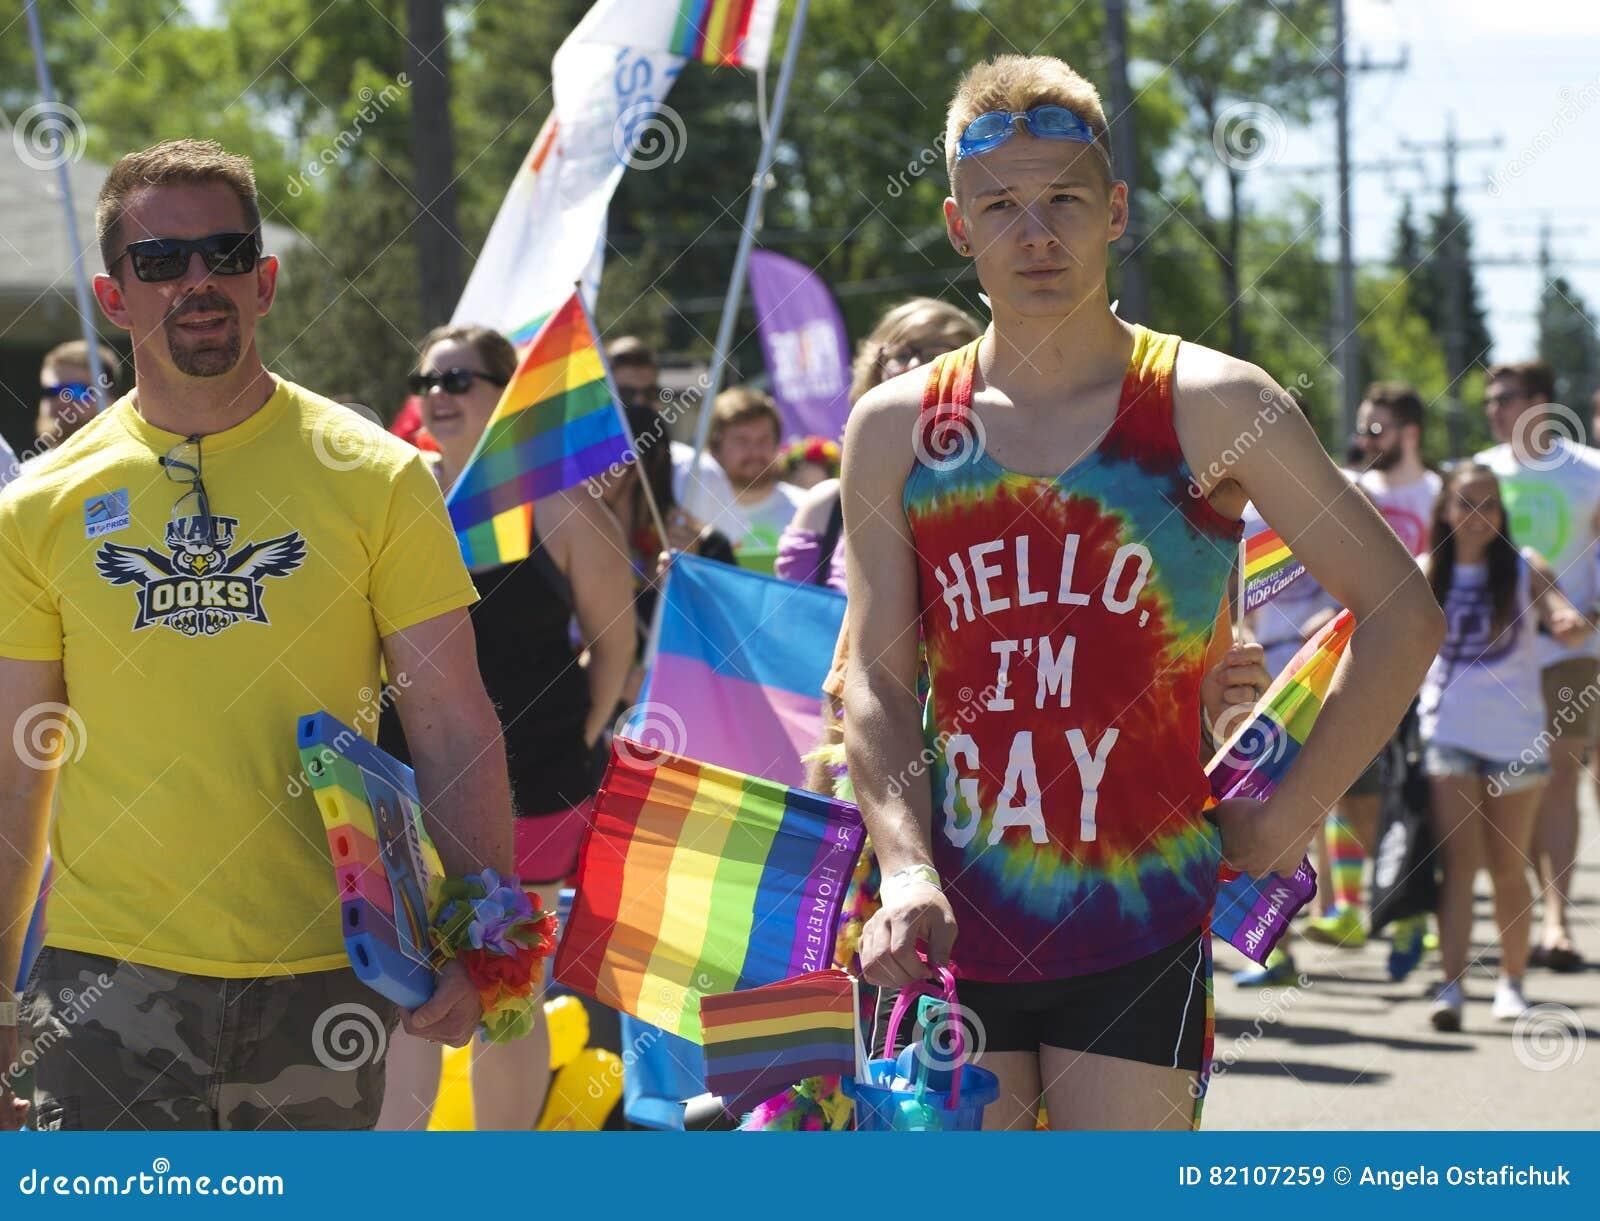 Edmonton, Canada-June 10, 2016: People celebrate pride